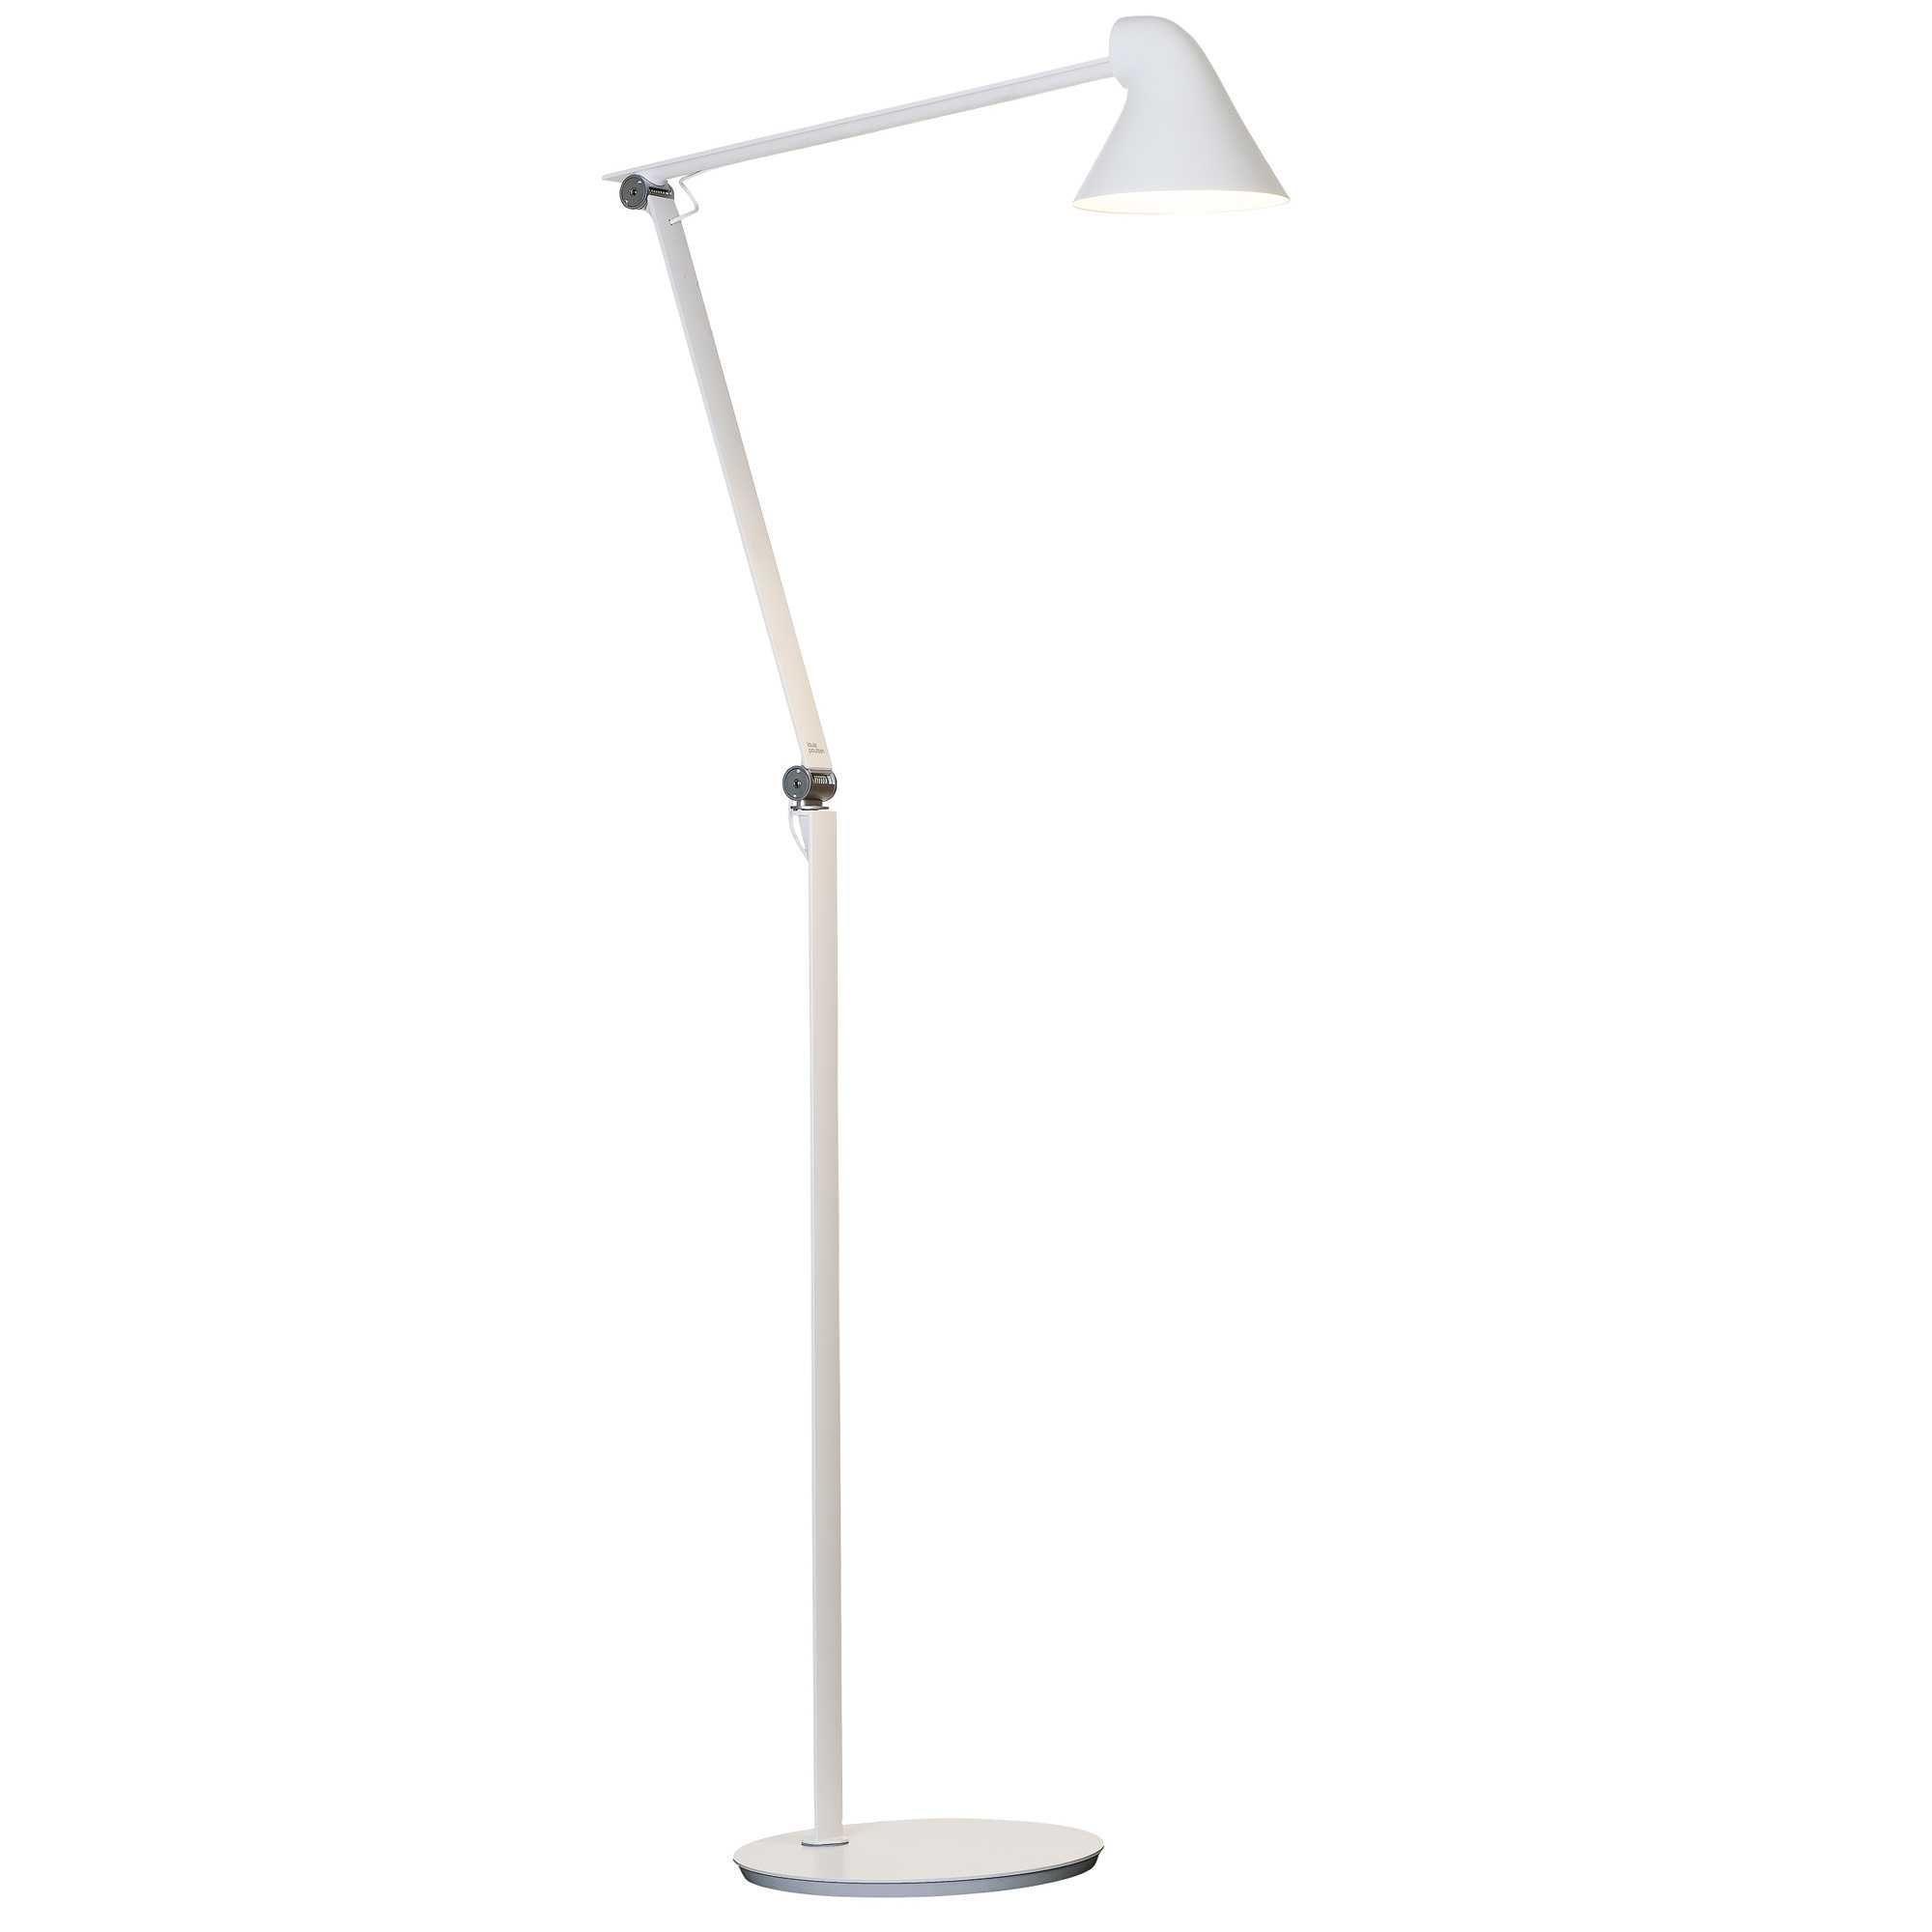 Louis Poulsen NJP vloerlamp LED wit